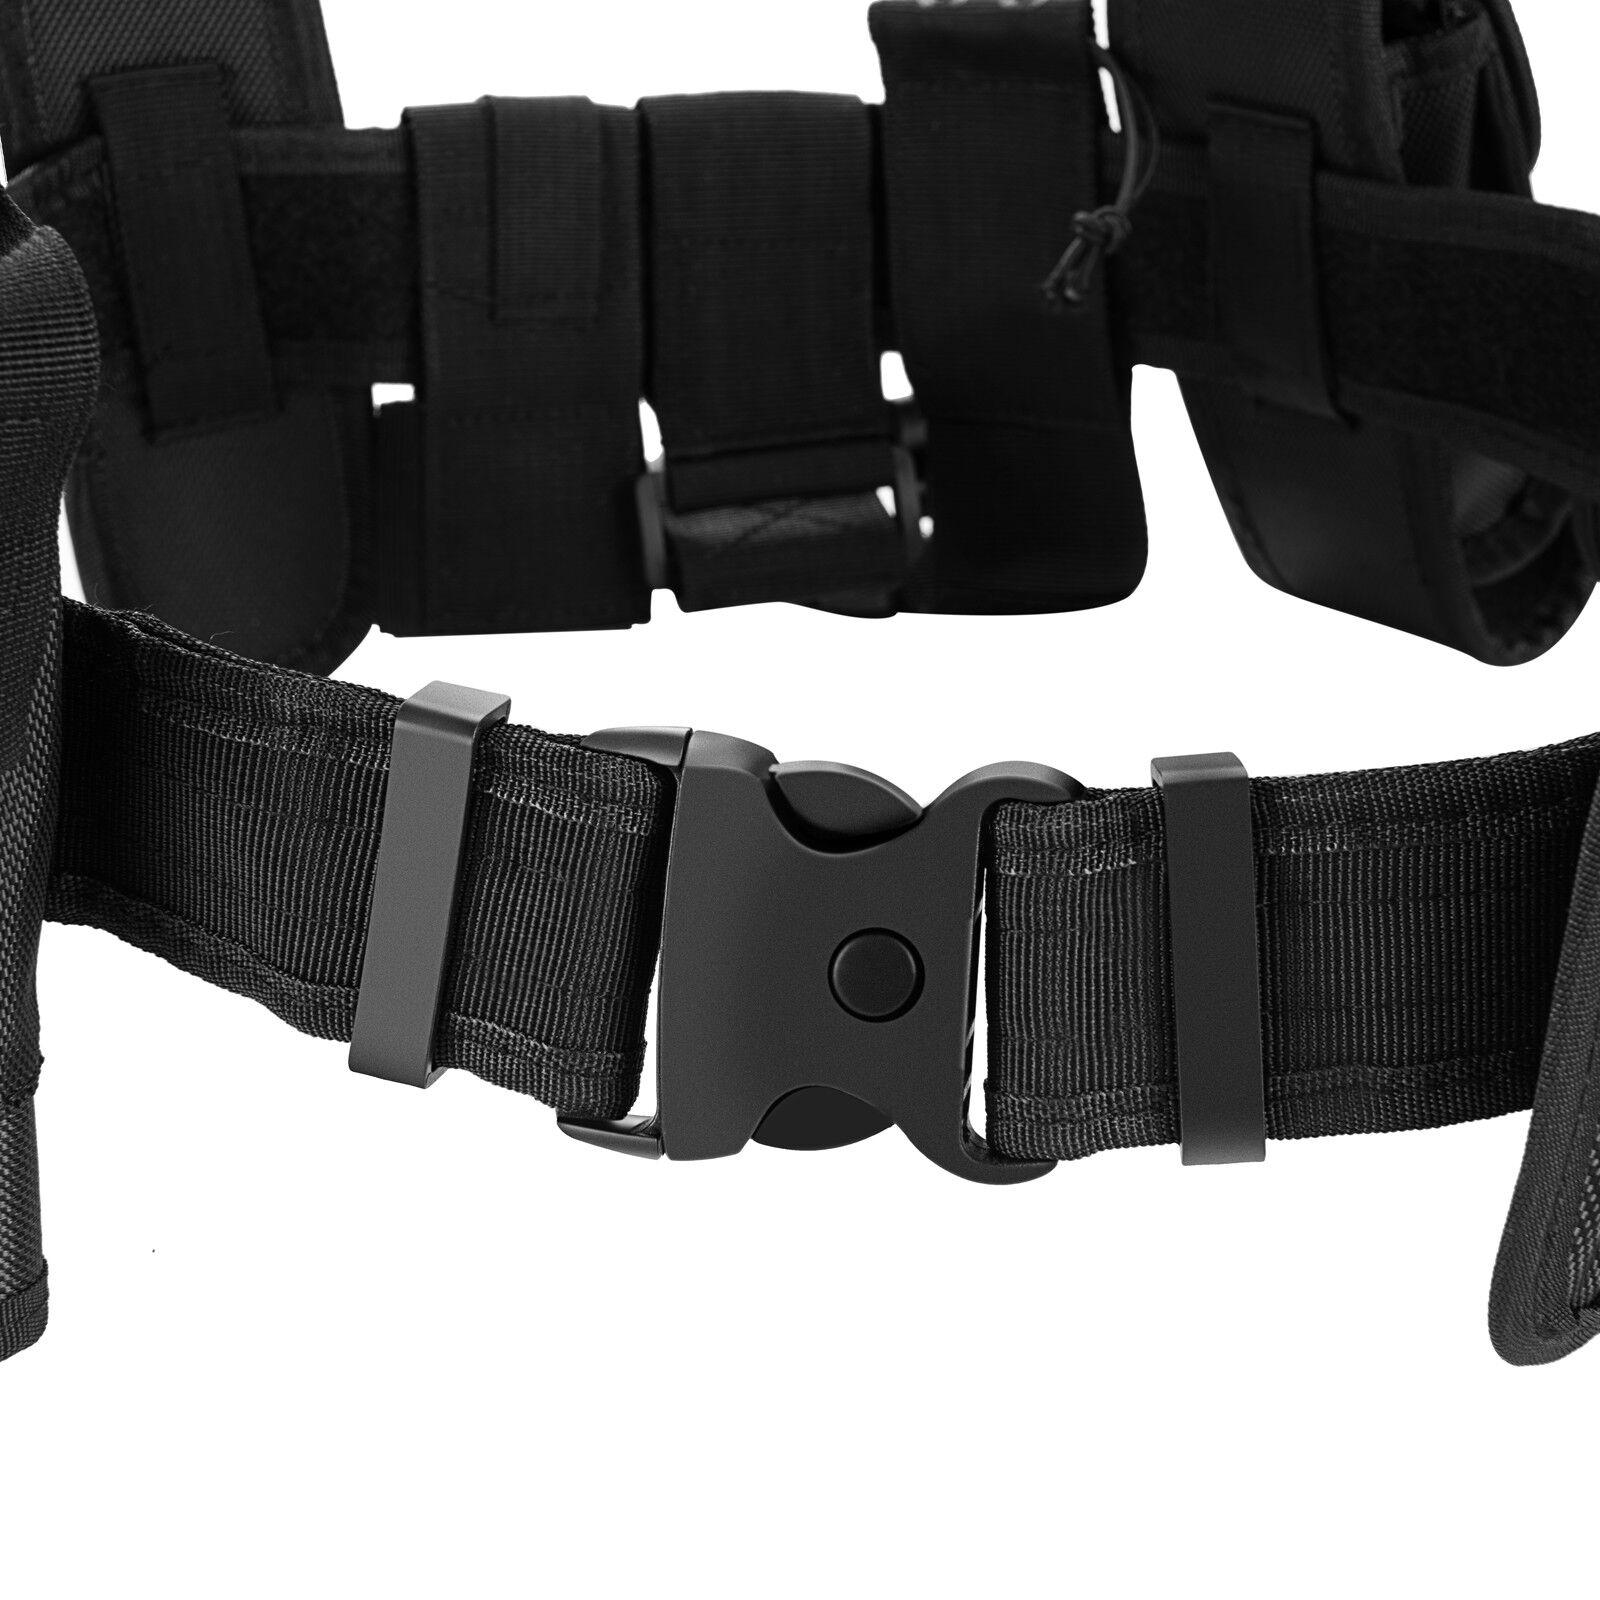 Police Security Guard Modular Enforcement Equipment Duty Belt Tactical 600 Nylon